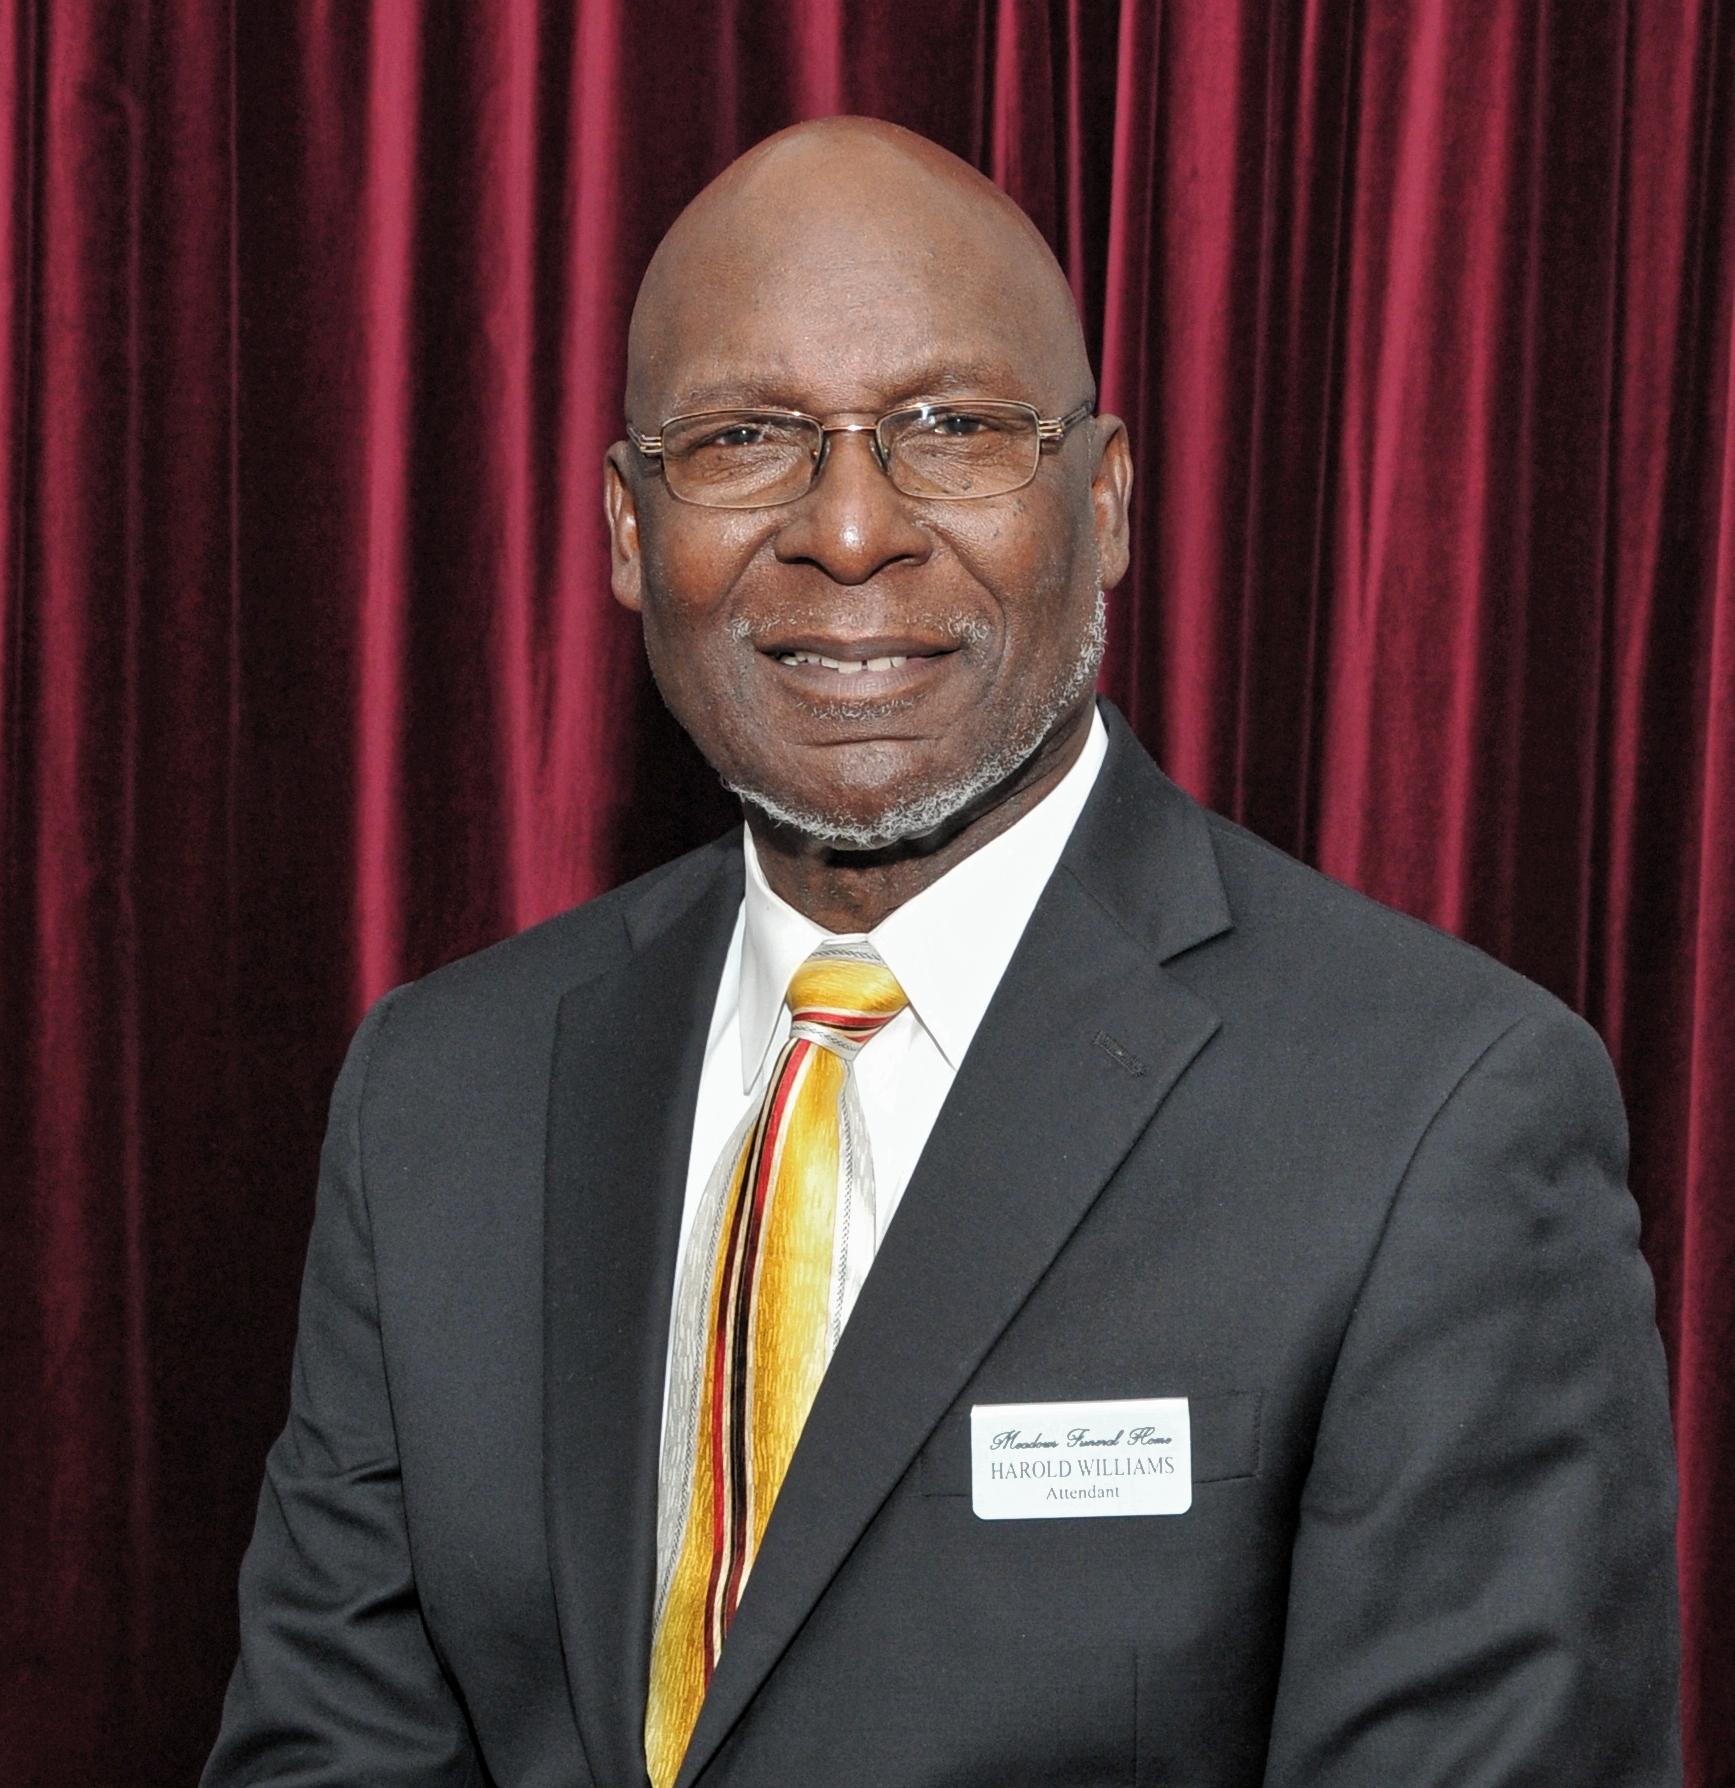 Mr. Harold Williams